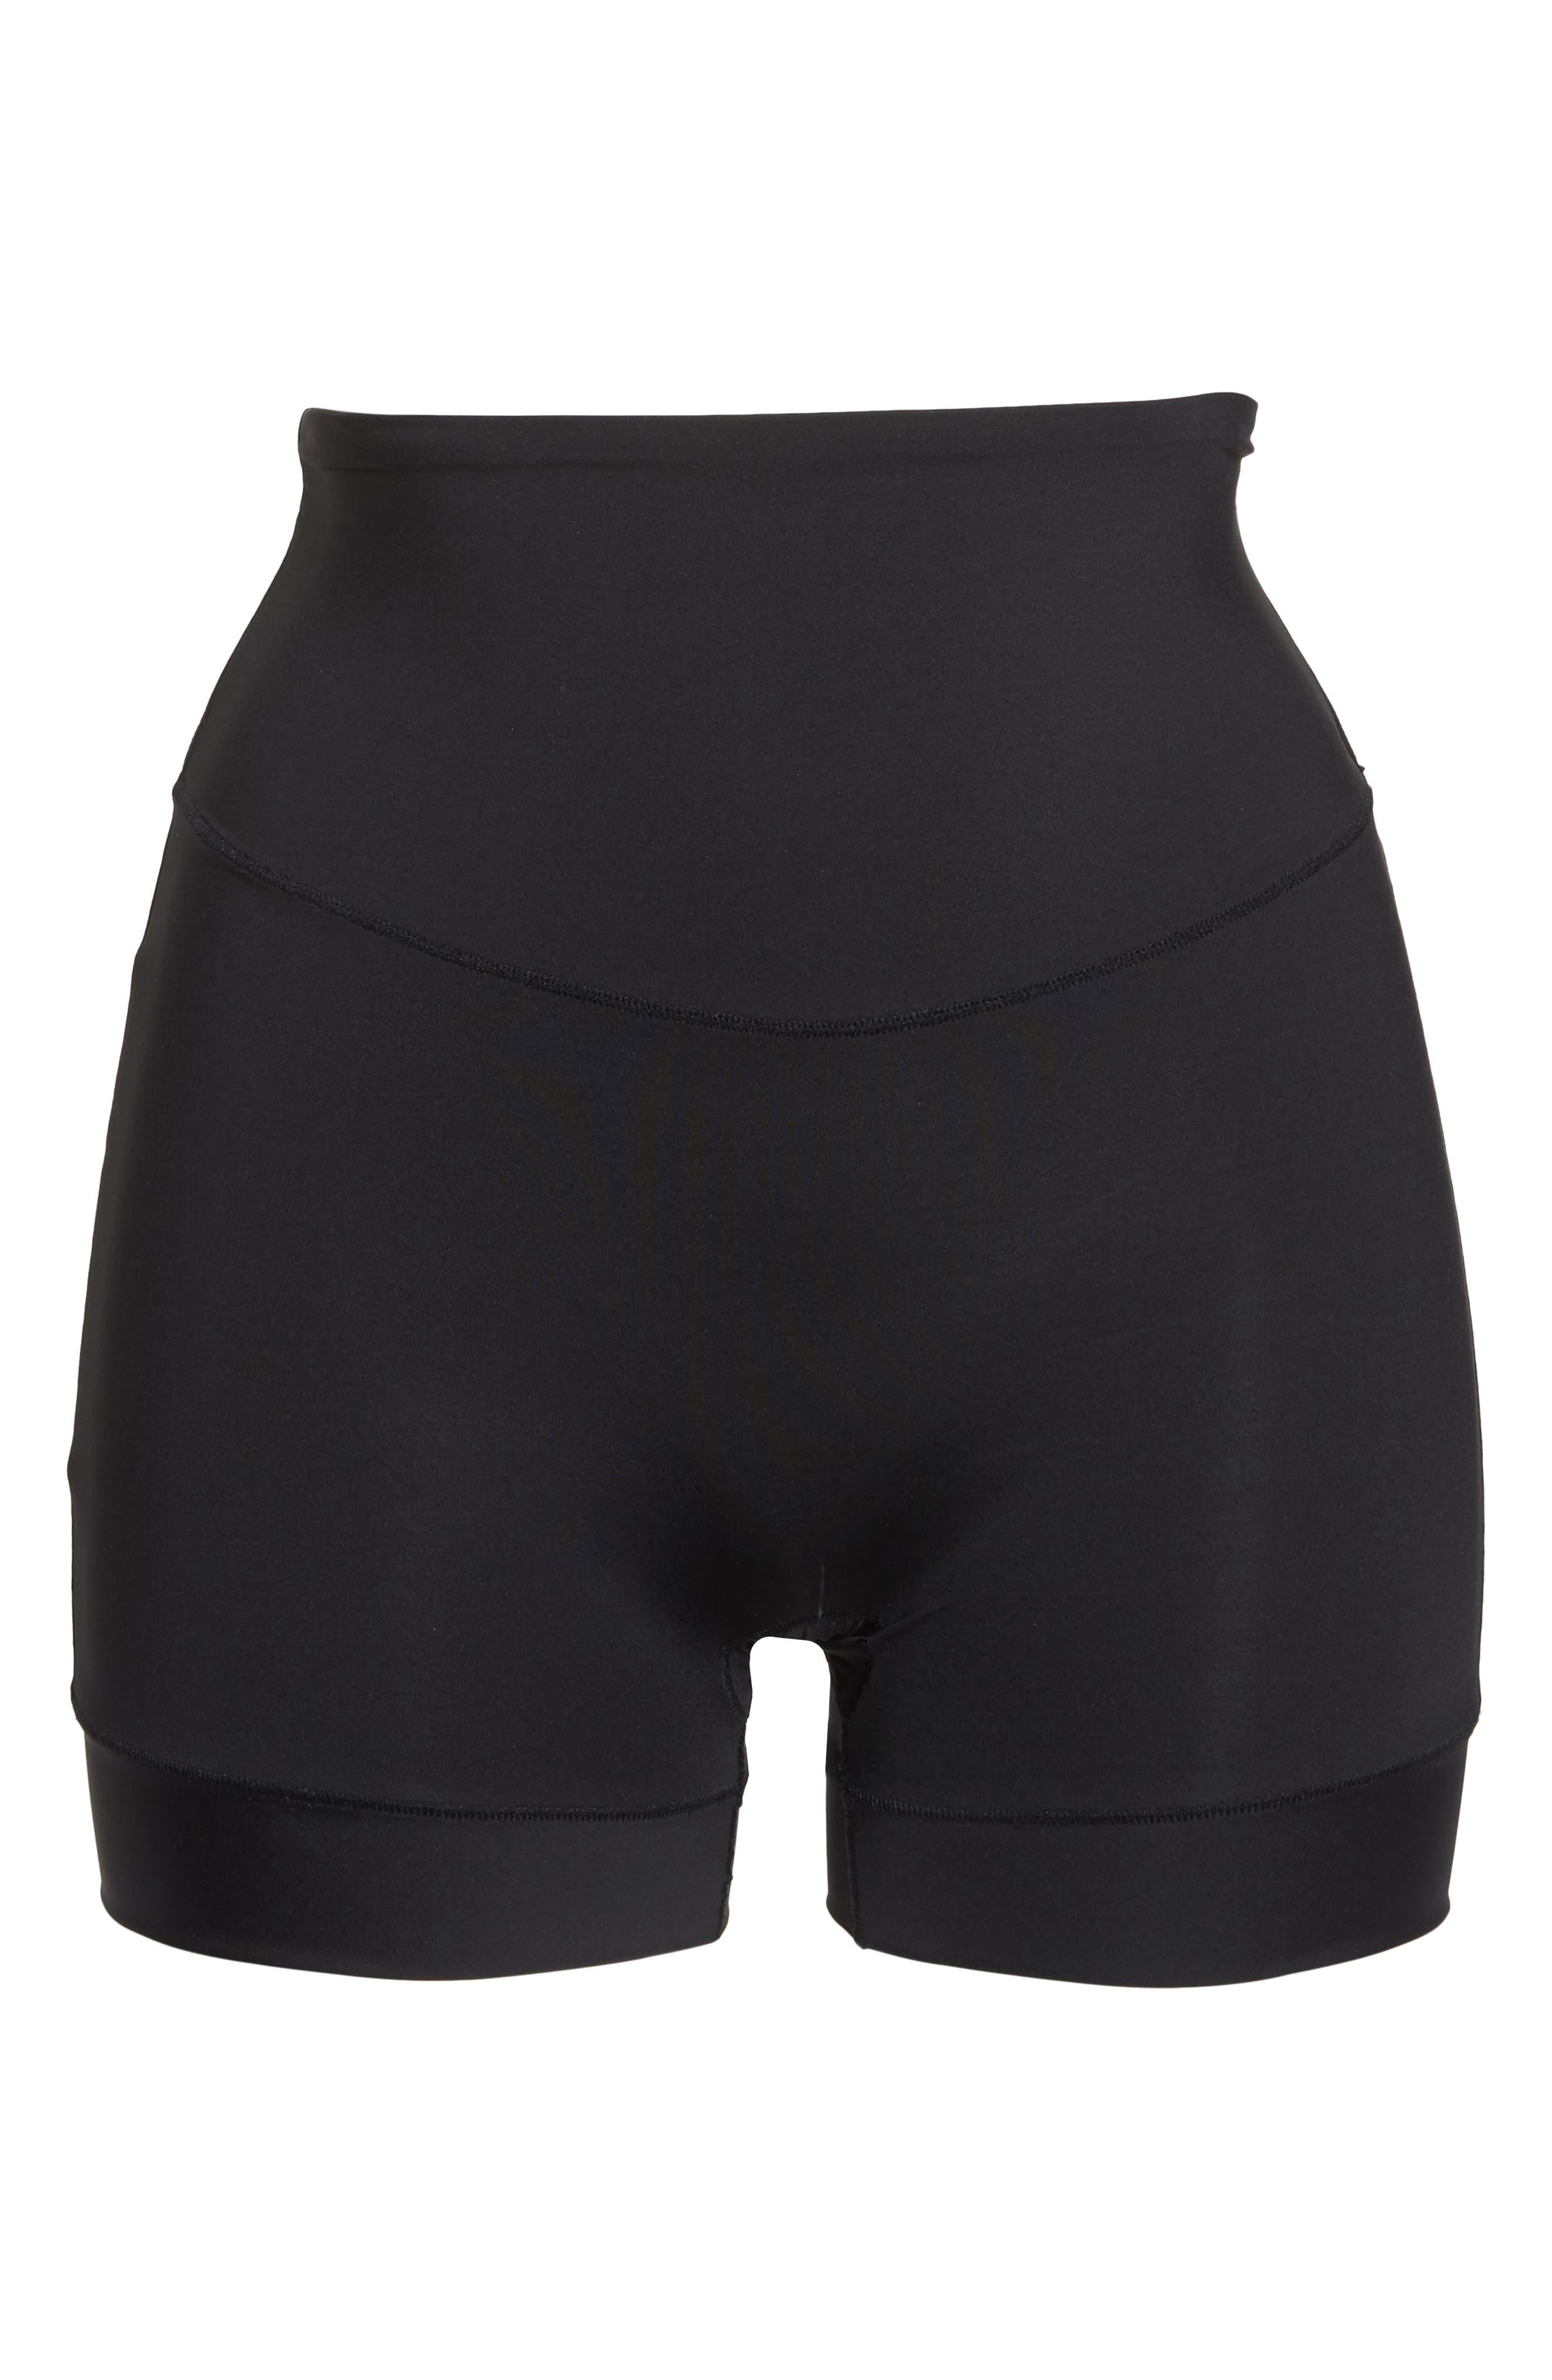 Tummie Tamers Mid Waist Shaping Shorts,                             Alternate thumbnail 6, color,                             001